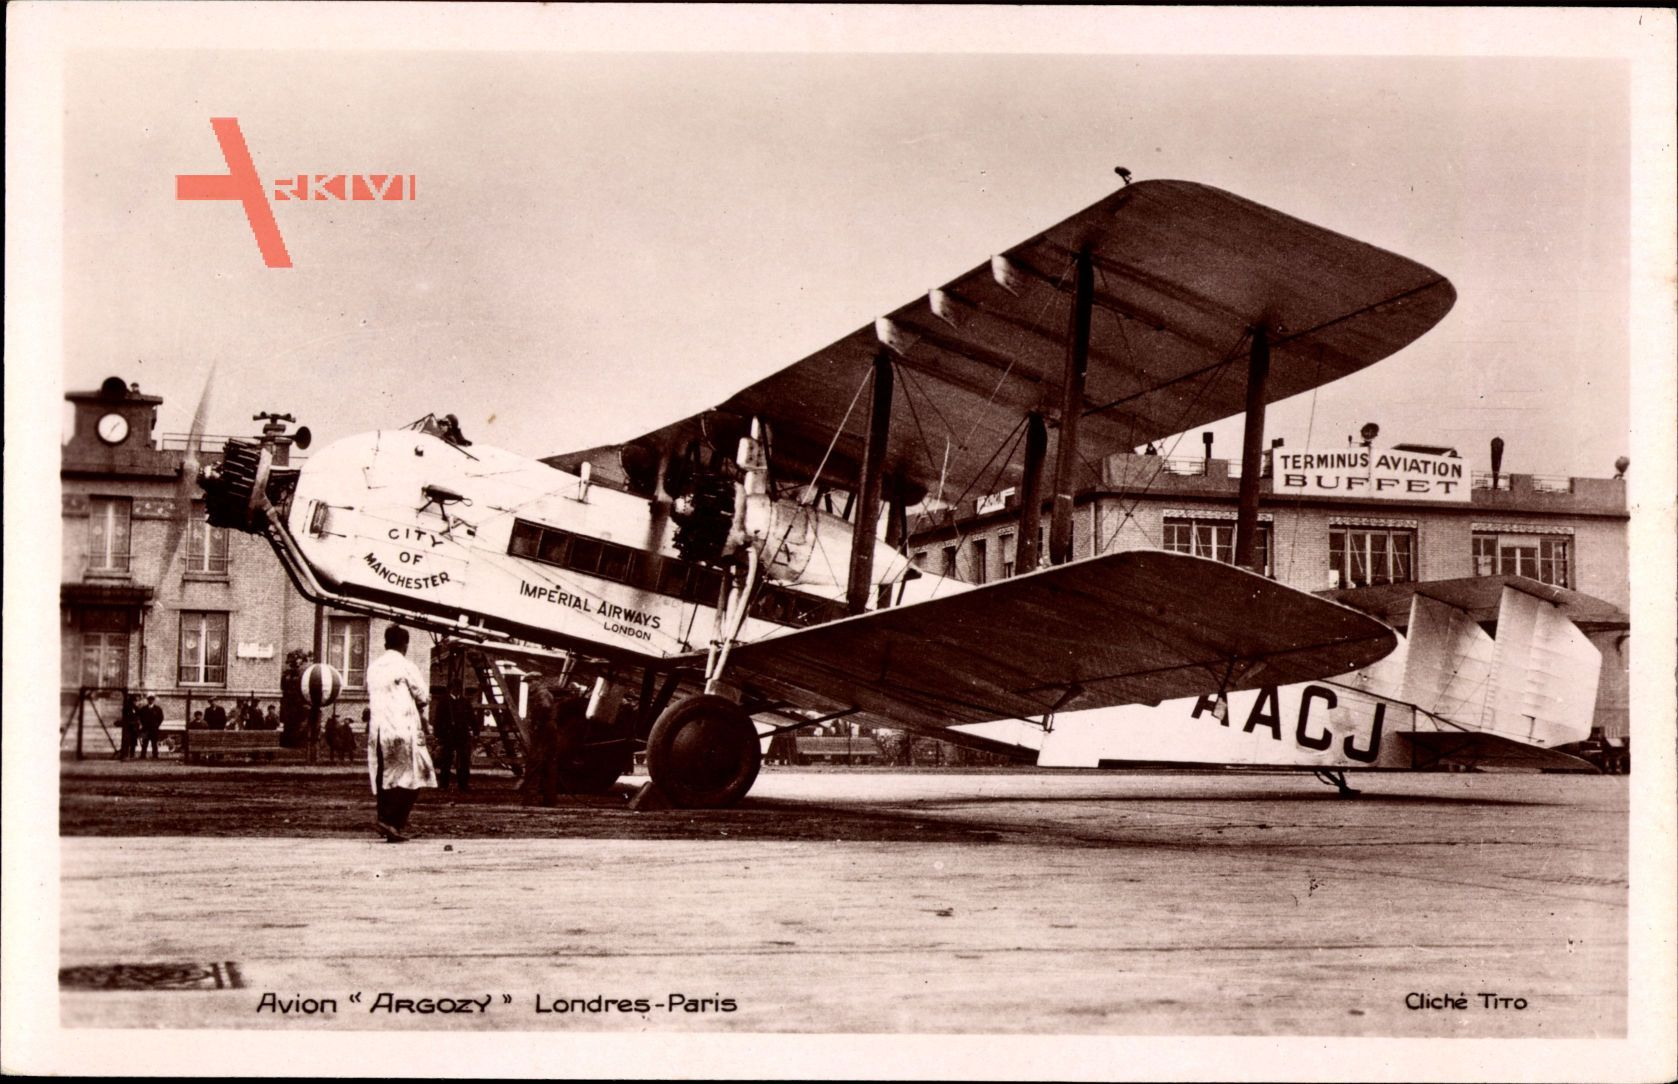 Avion Argozy, Londres Paris, City of Manchester, Imperial Airways